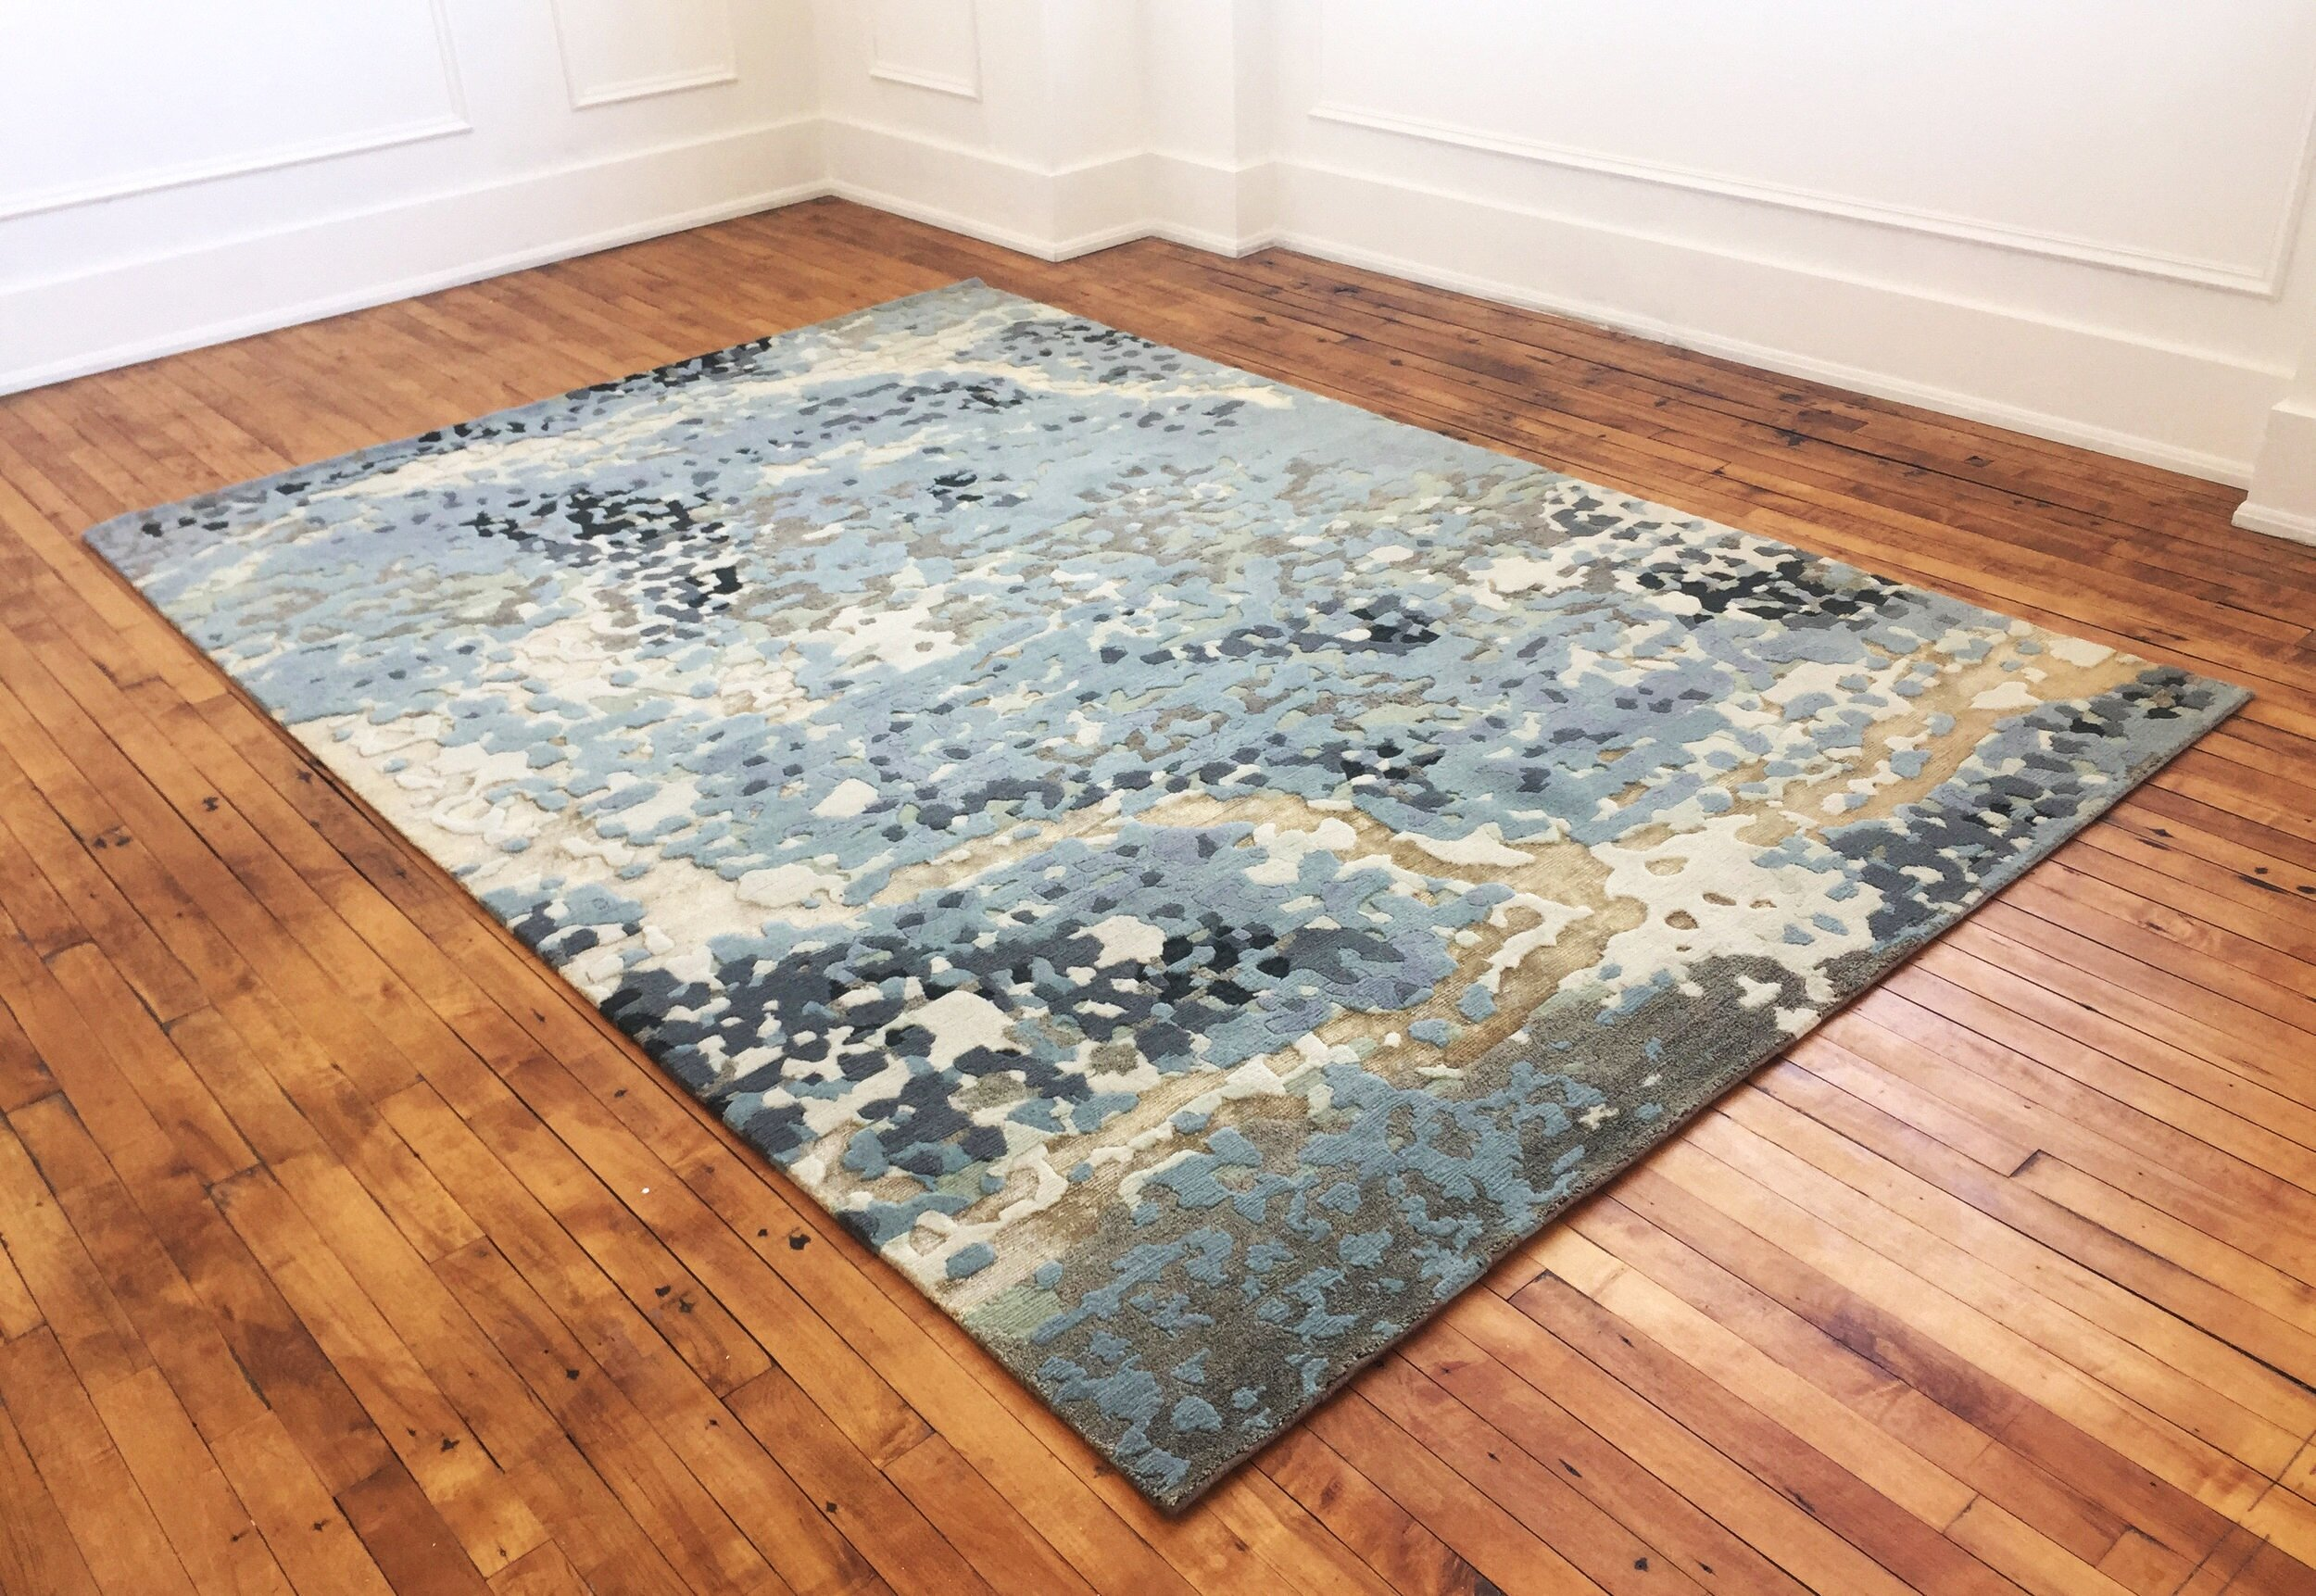 Daphne  | Custom rug for Attic Gold in Toronto | Wool, Silk & Hemp | 6'x9' | 2017